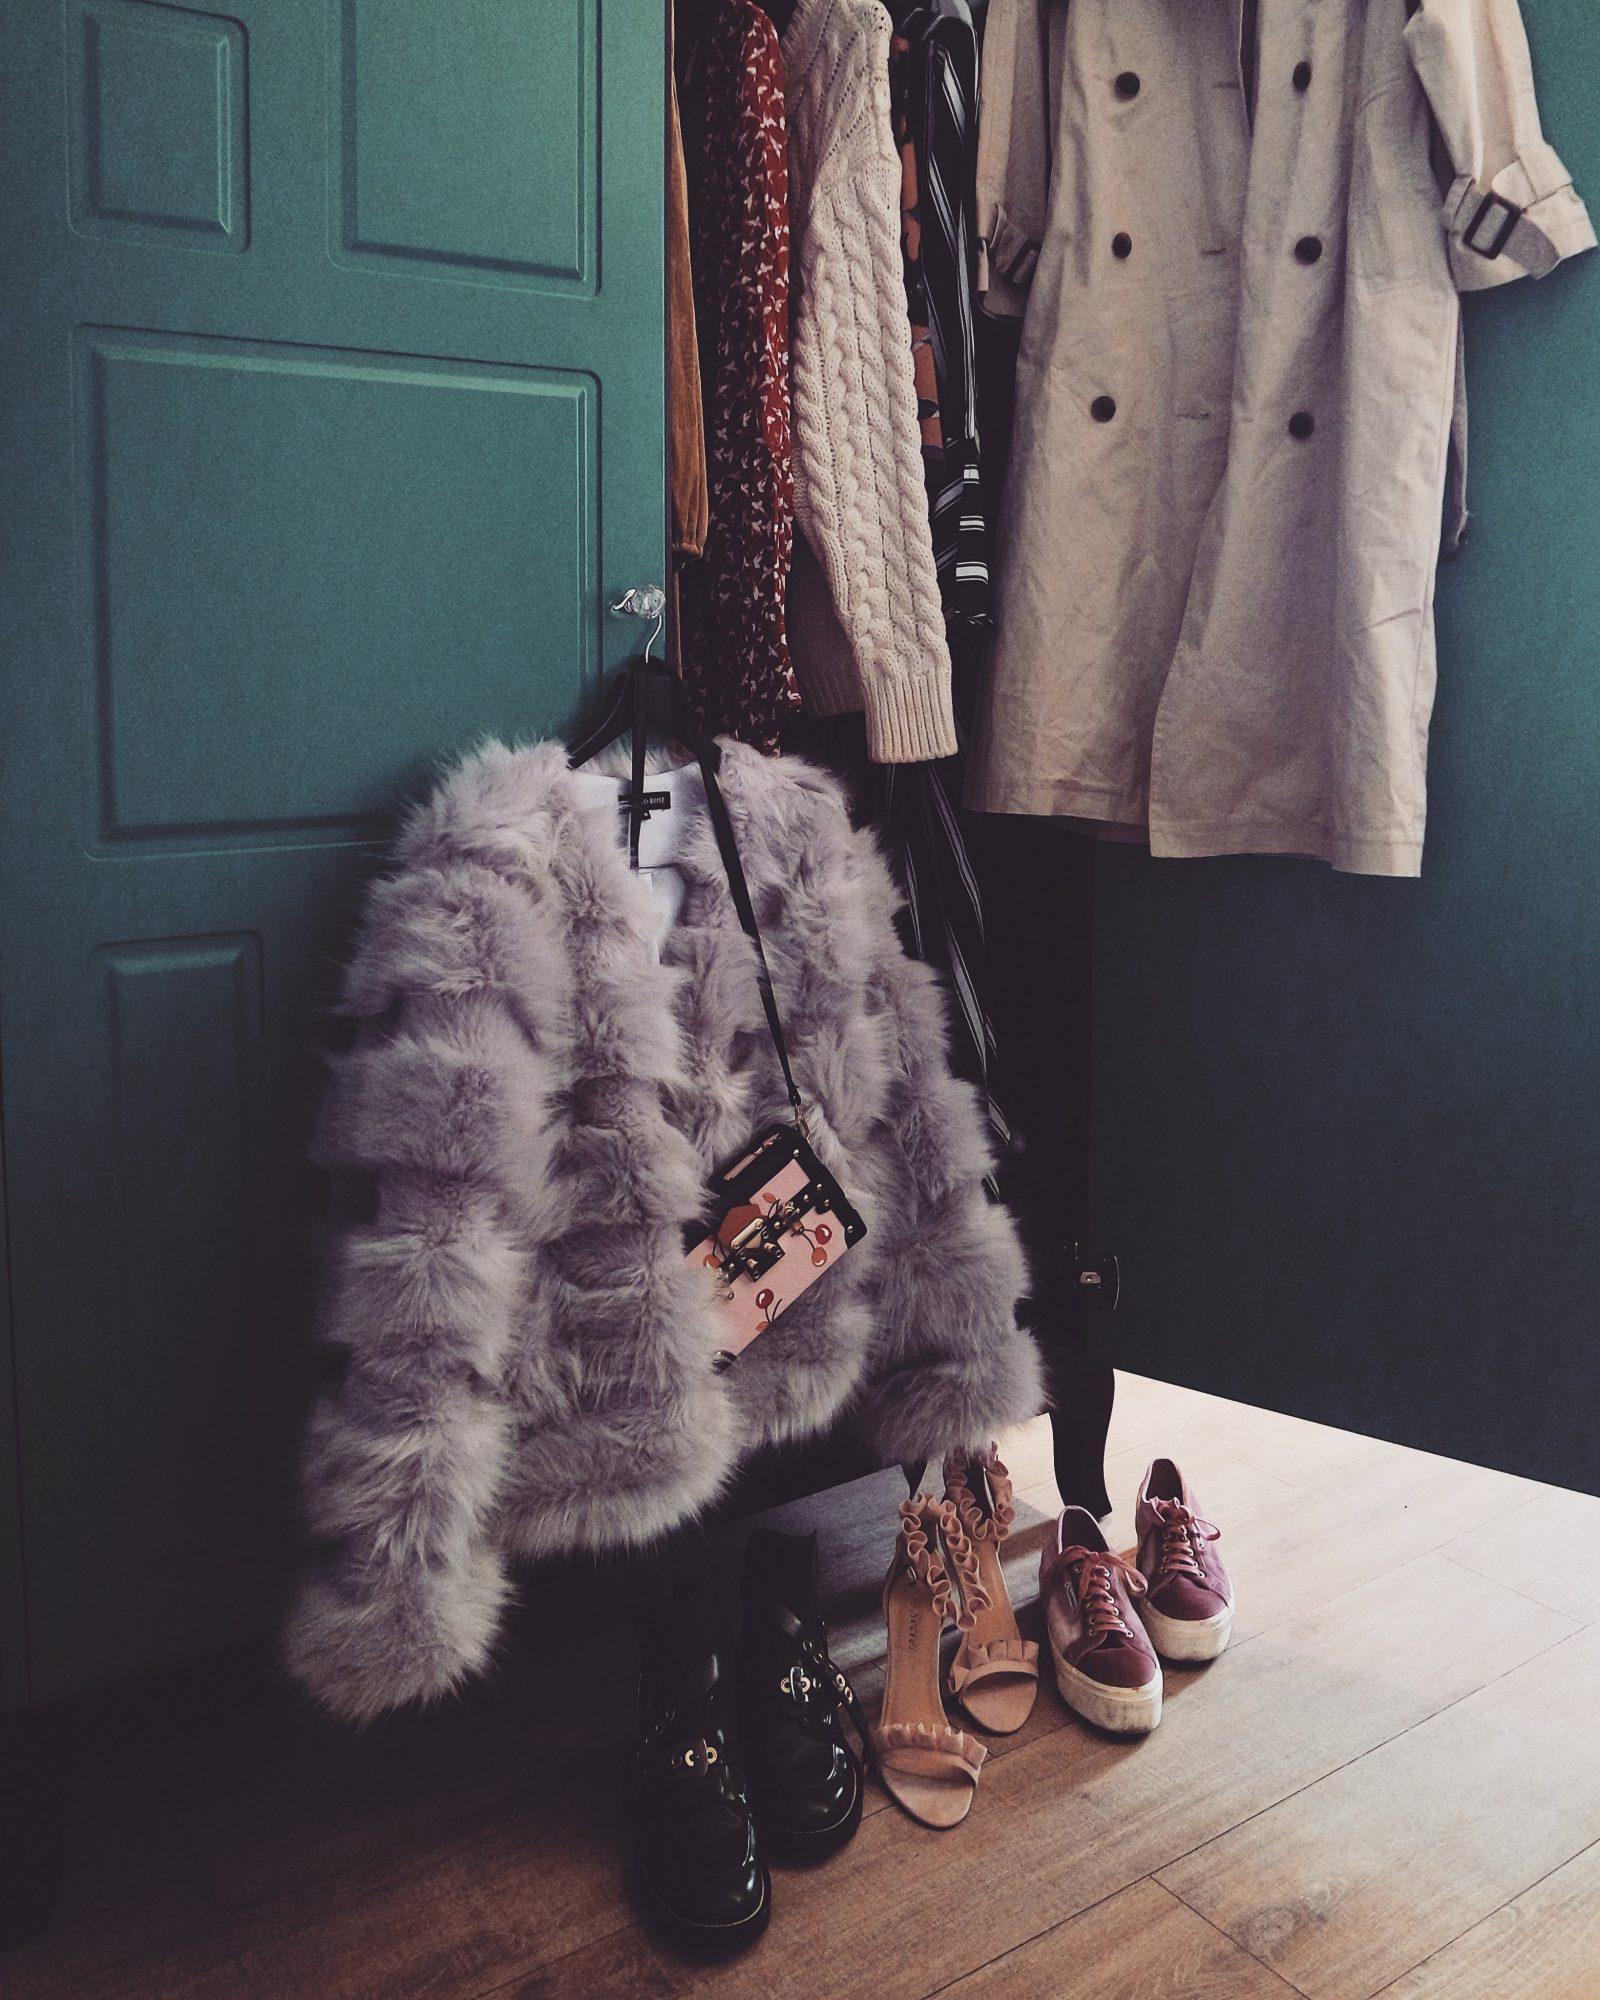 Hotel Indigo Kensington Fashion Week Wardrobe